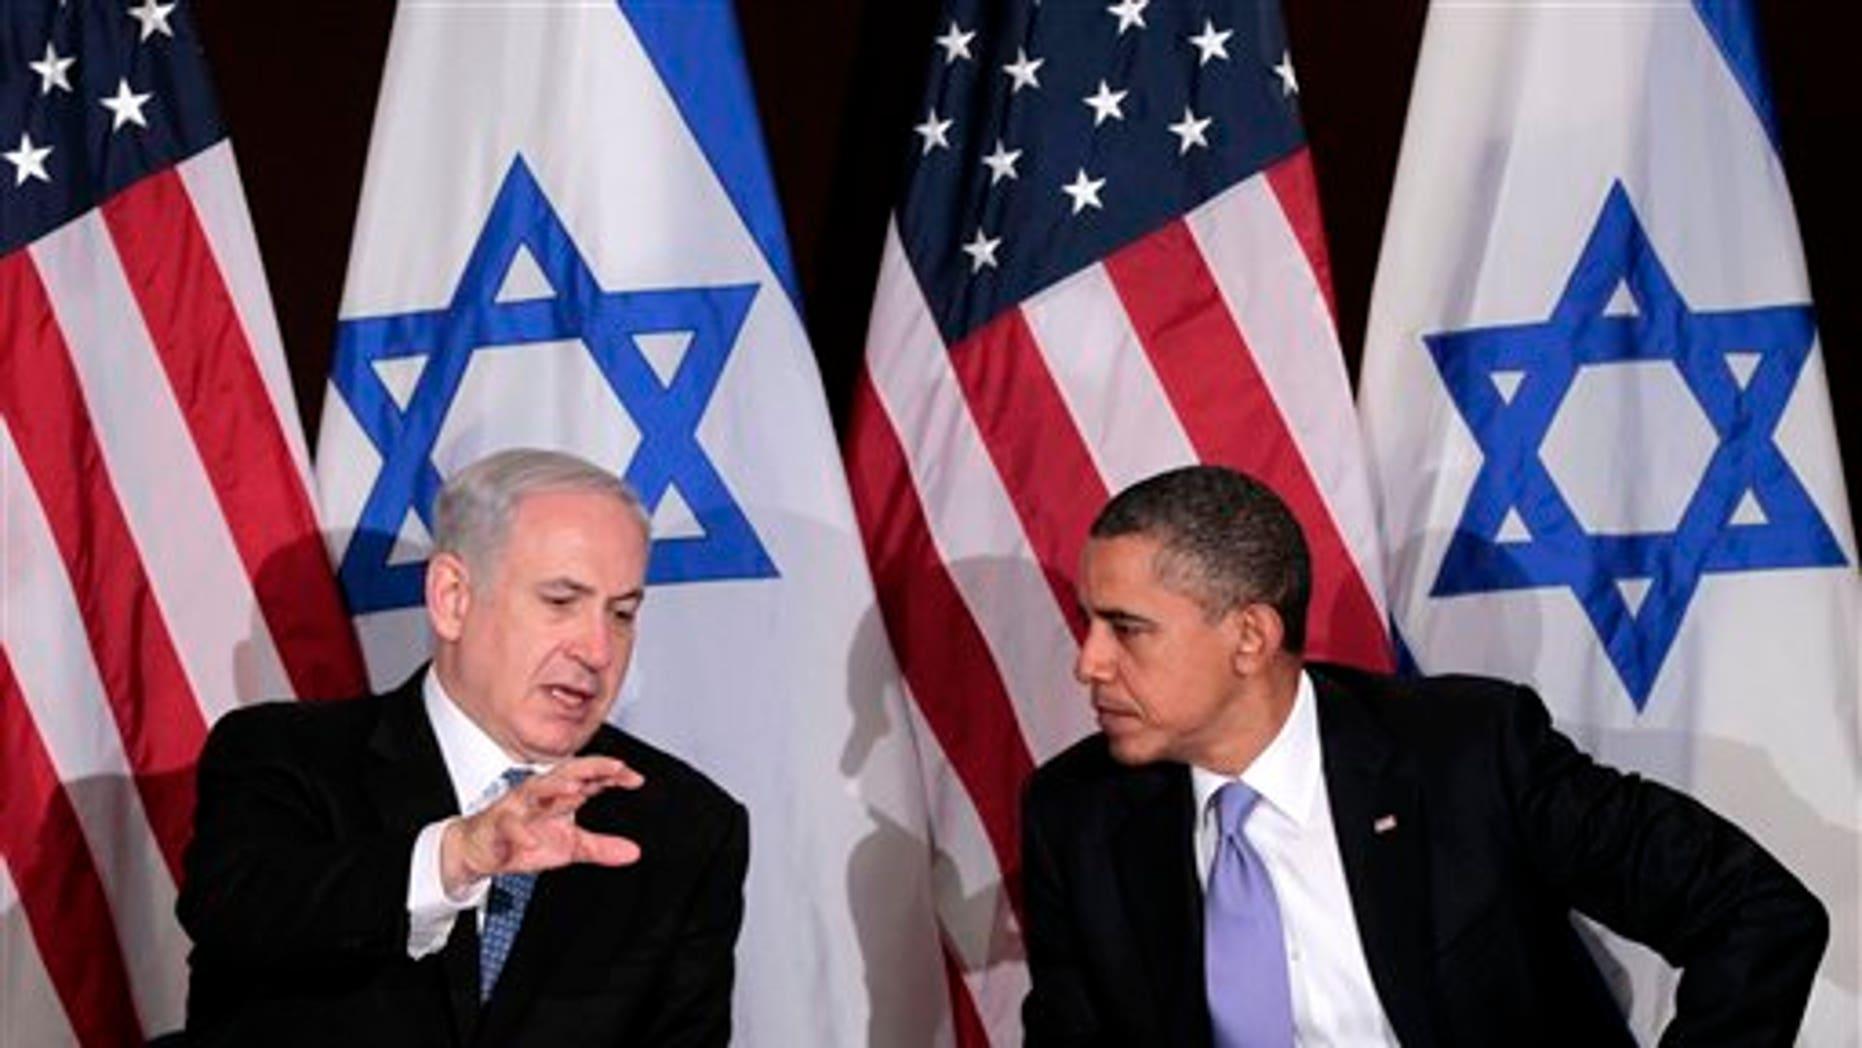 September 21: President Barack Obama meets with Israeli Prime Minister Benjamin Netanyahu at the UN Building in New York.